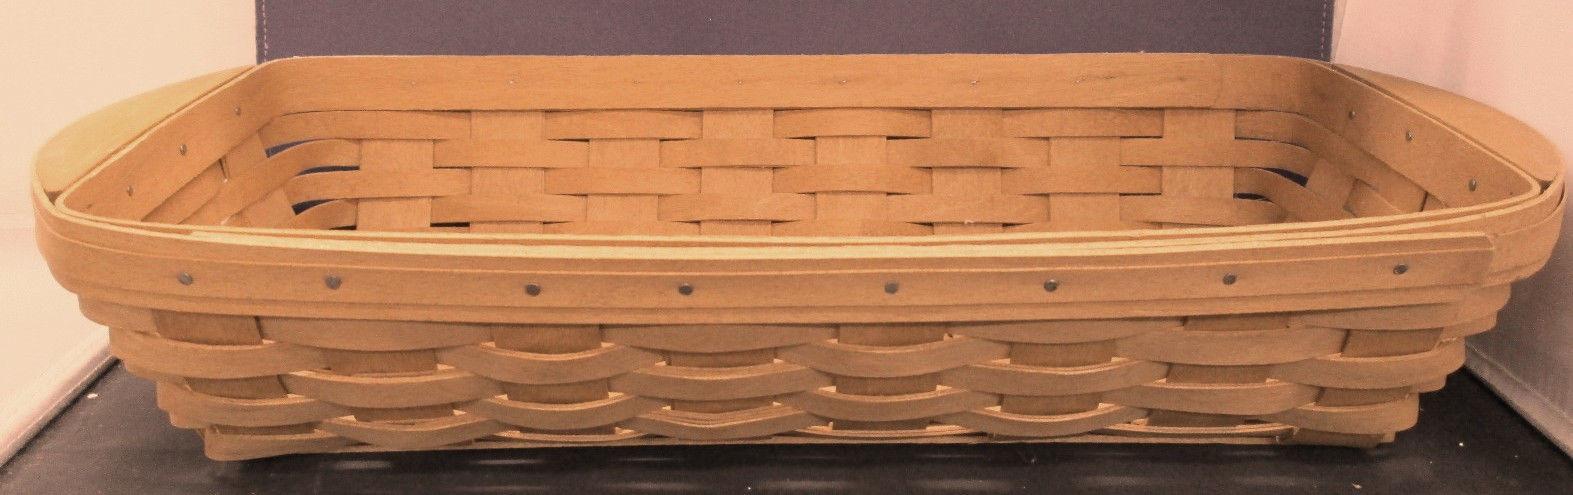 Longaberger Long Serving Basket Toboso Plaid Fall Over Edge Liner New In Bag image 2